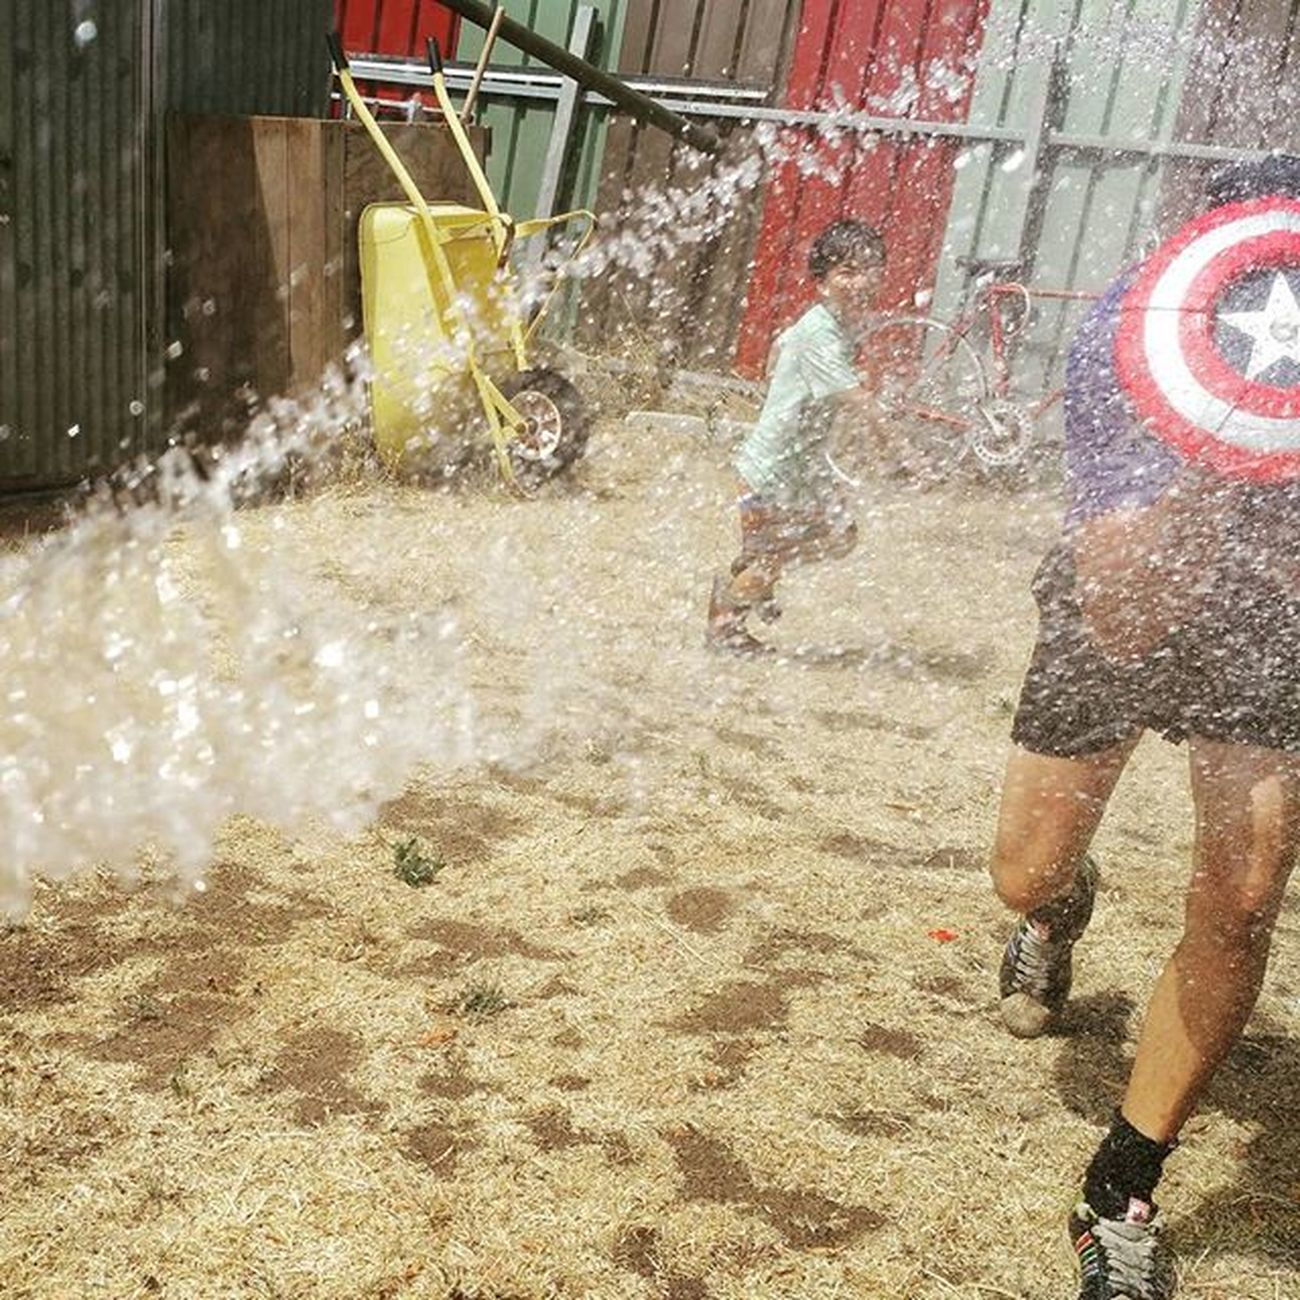 Captain America about to attack me on Australia Day hahaha Backyardigans Aussiesummer Australiaday2016 Waterfight Goodfun Straya Bigkidswithkids Boysvsgirl Keepingupwithmem